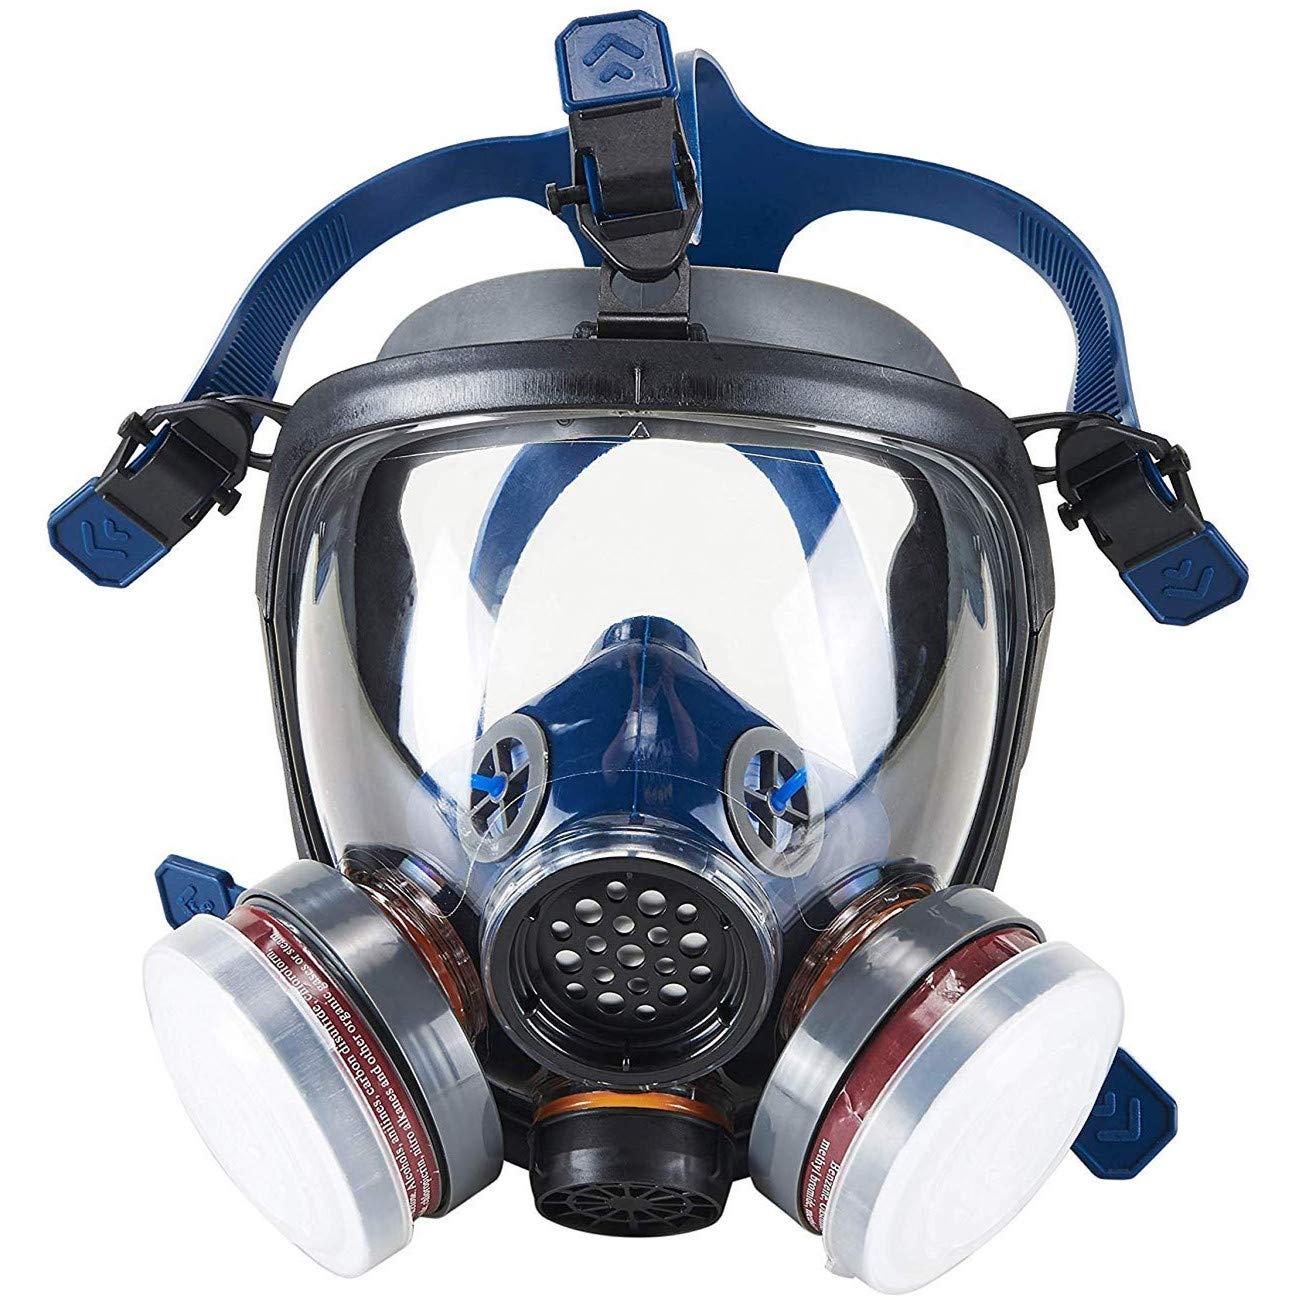 Organic Vapor Full Face Respirator Safety Mask, IVSUN Activated Carbon Respirator Paint Respirator Gas Chemical Dustproof Pesticides Mask (Respirator +1 Pair LDY3 Cartridges) by IVSUN (Image #1)